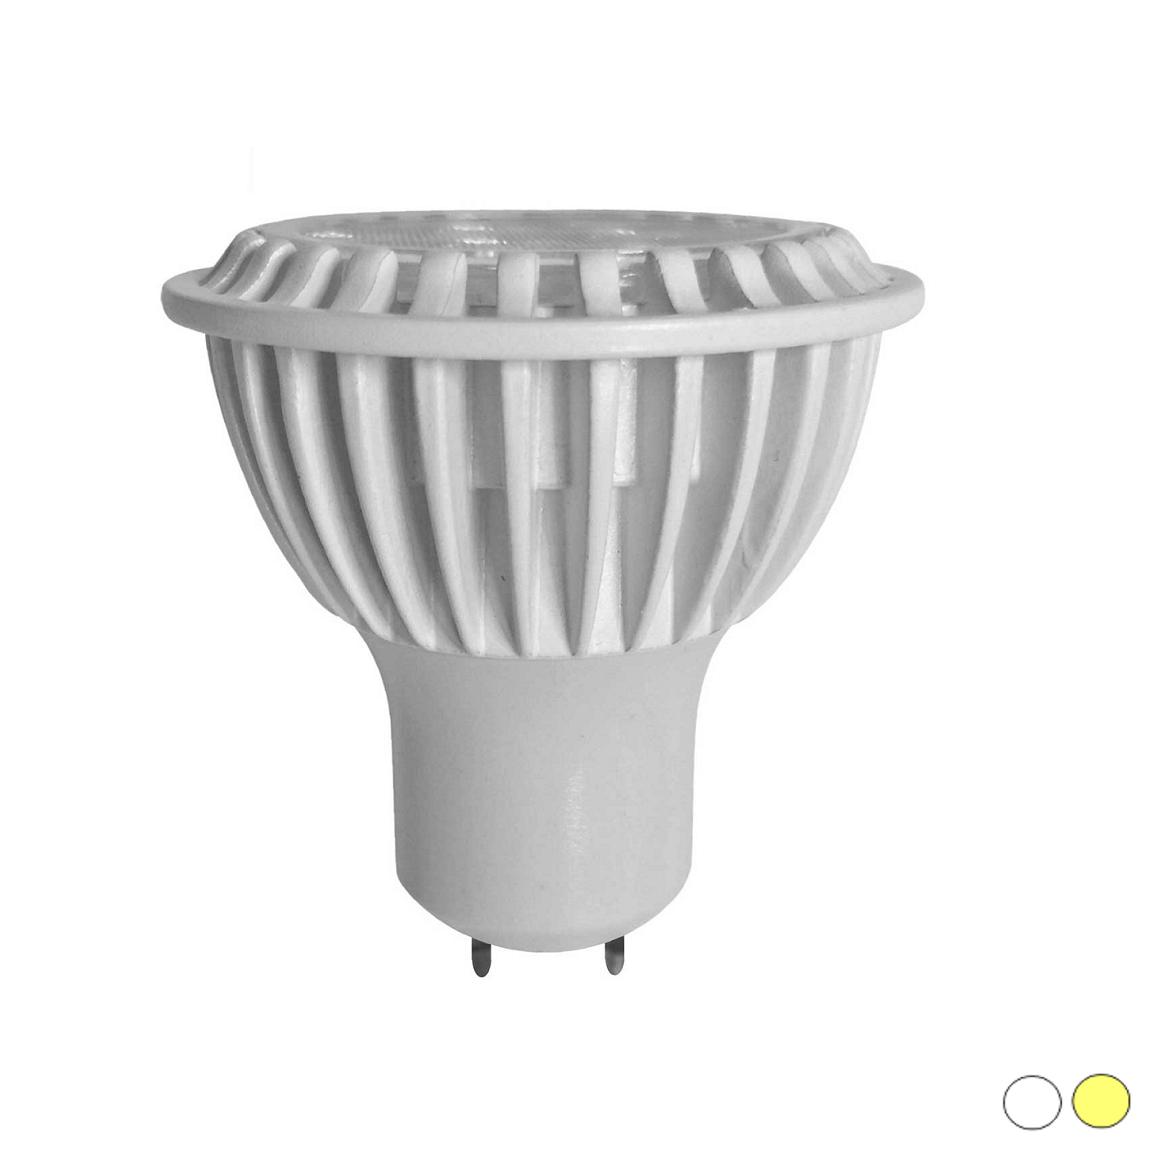 FORLIFE FL-1652 M - GU5.3 Duylu 7 Watt LED Spot Ampulü